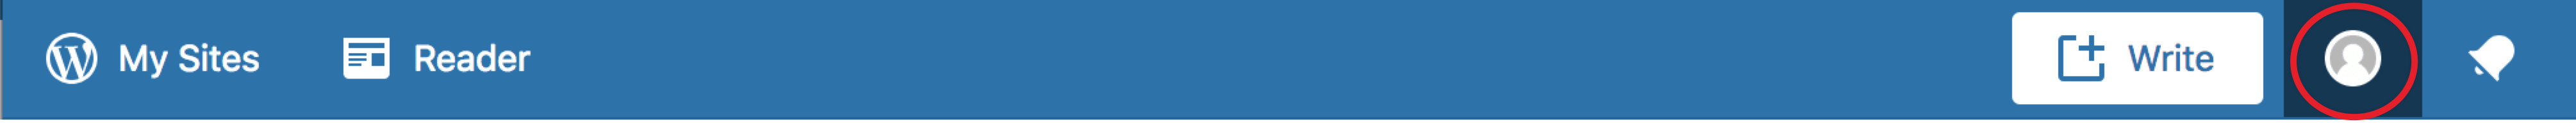 wpcom_masterbar_aug2018_gravatar.png